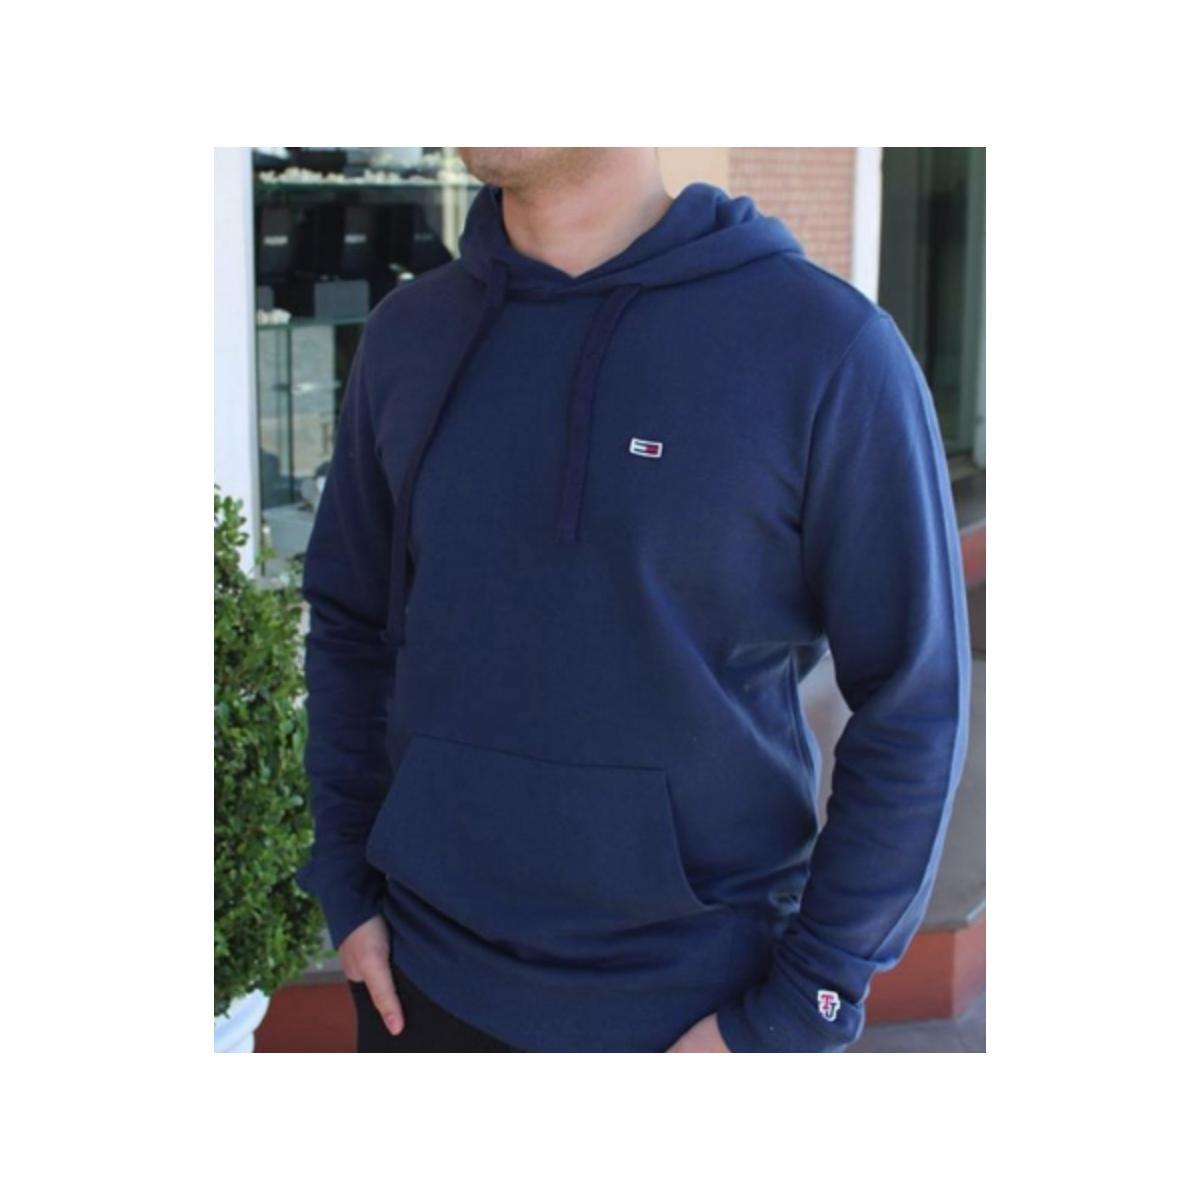 Blusão Masculino Tommy Tjdmodm06761 Marinho